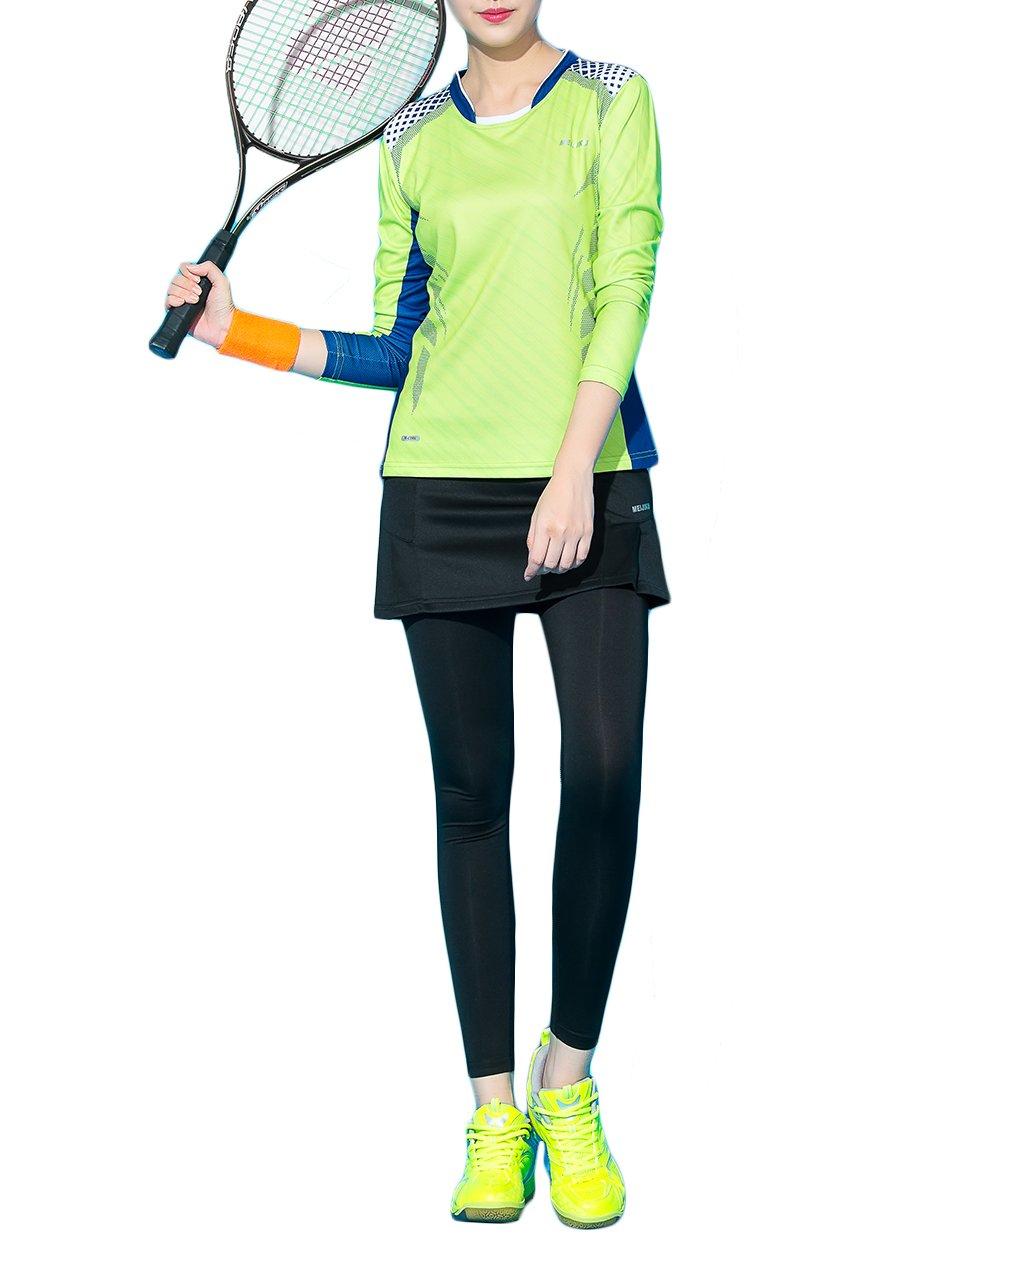 Women 's Proシャツスカートwithレギンス通気性2018の新しいデザインファッションテニス、ゴルフ、バドミントン XL  B077TLYH1V